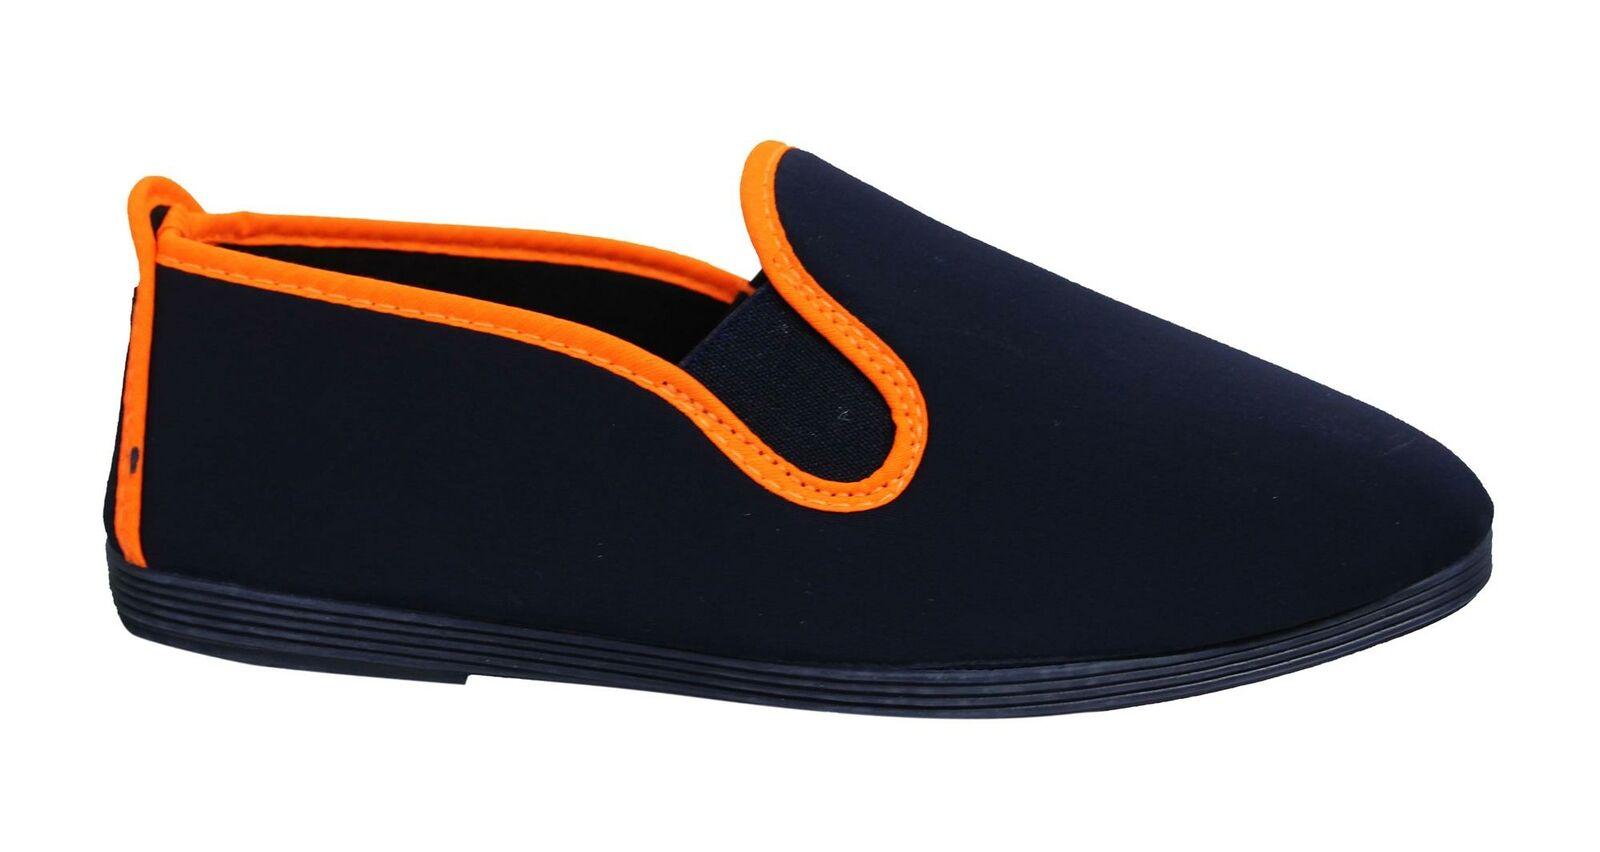 Flossy Style Gallur Unisex Espadrille Slip On Plimsolls Shoes 5556 Navy